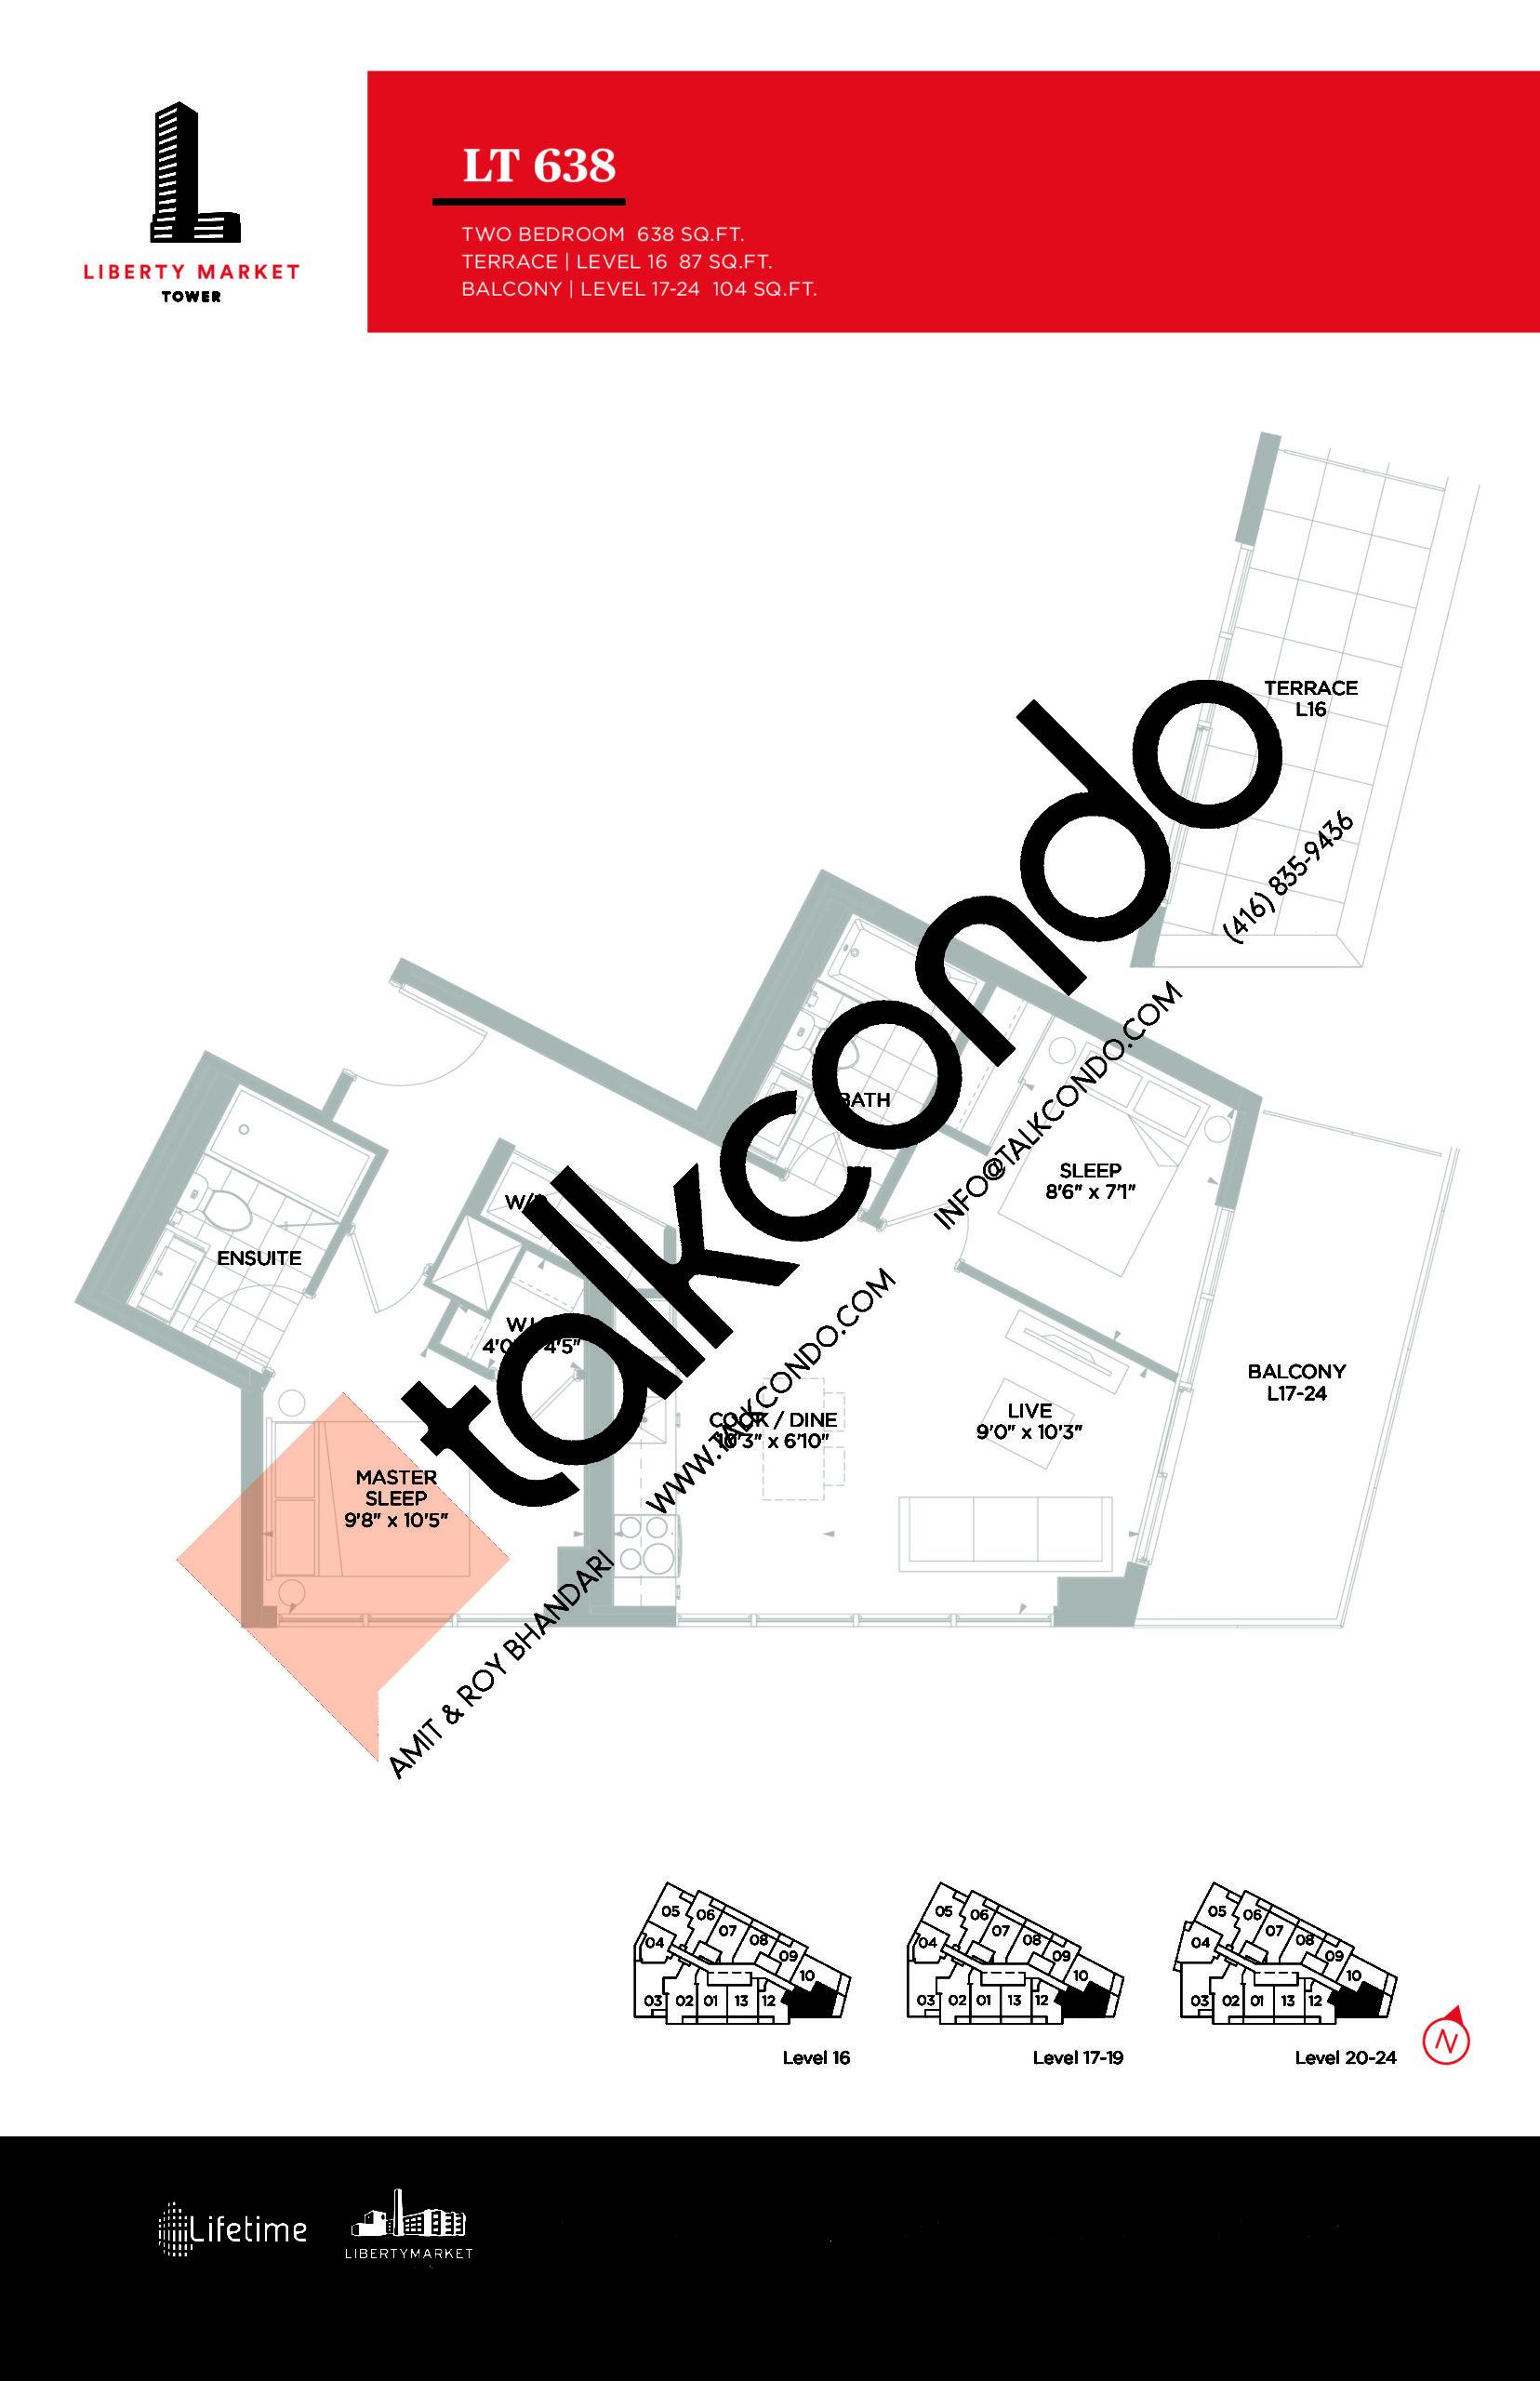 LT 638 Floor Plan at Liberty Market Tower Condos - 638 sq.ft